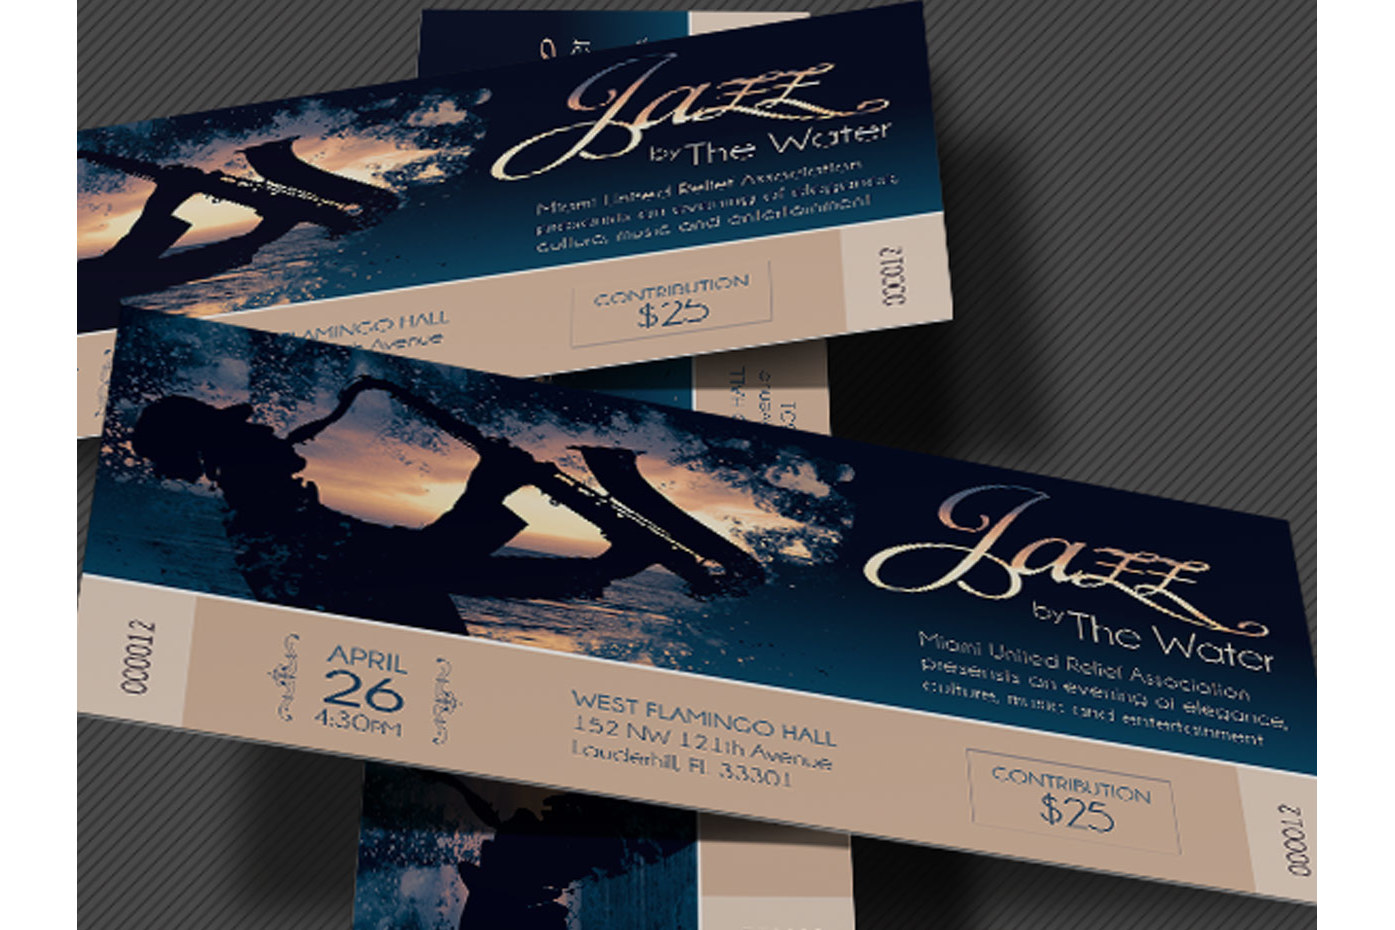 Jazz Concert Event Ticket Template example image 3